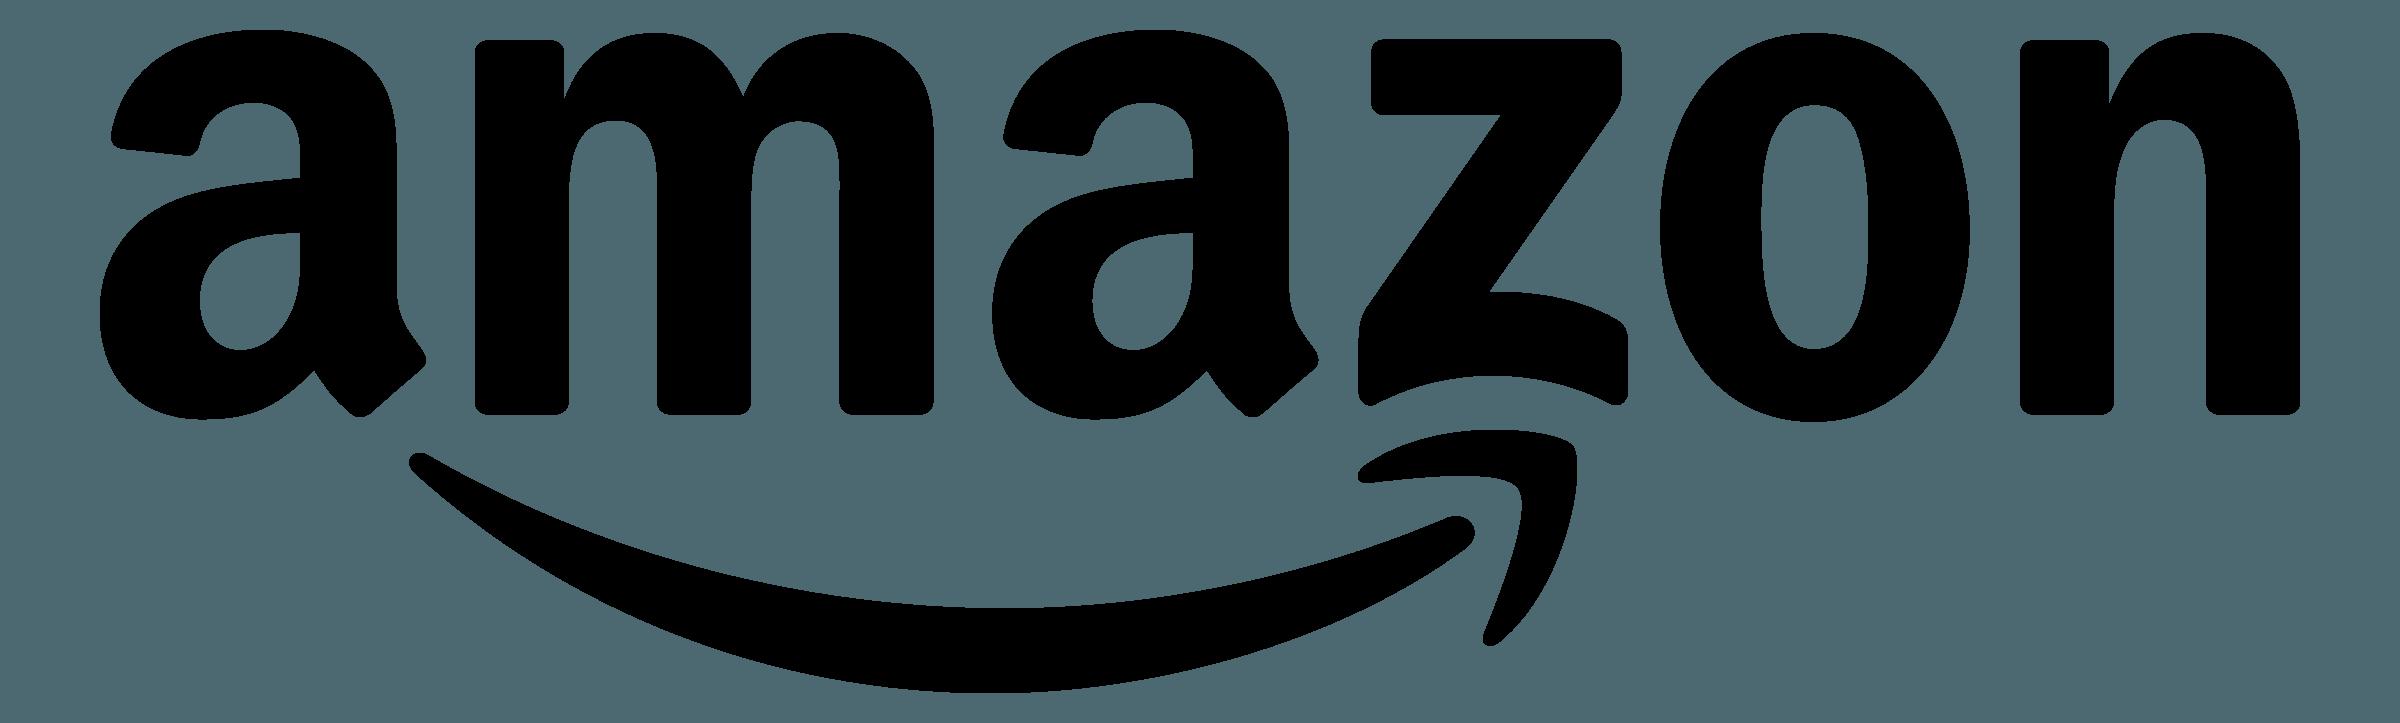 2400x723 Amazon Logo Png Transparent Amp Svg Vector